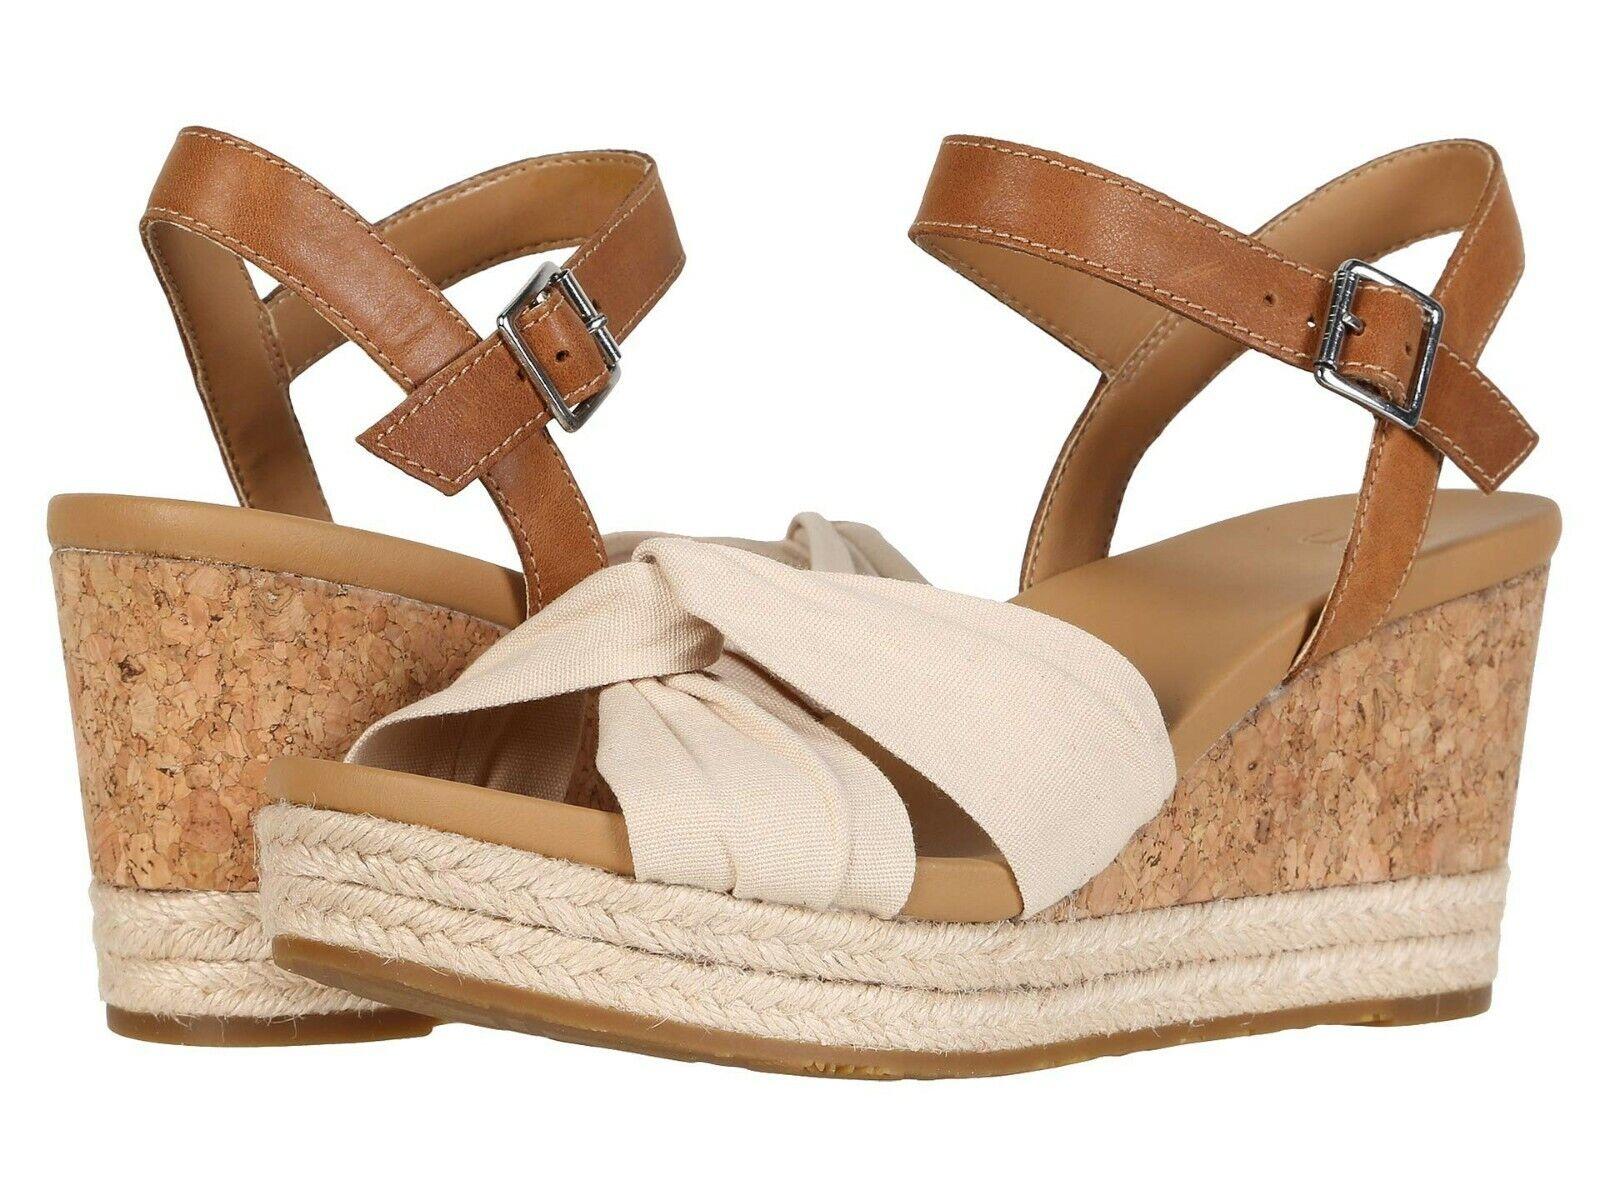 Women's Shoes UGG JOSLYN Leather & Canvas Platform Wedge San